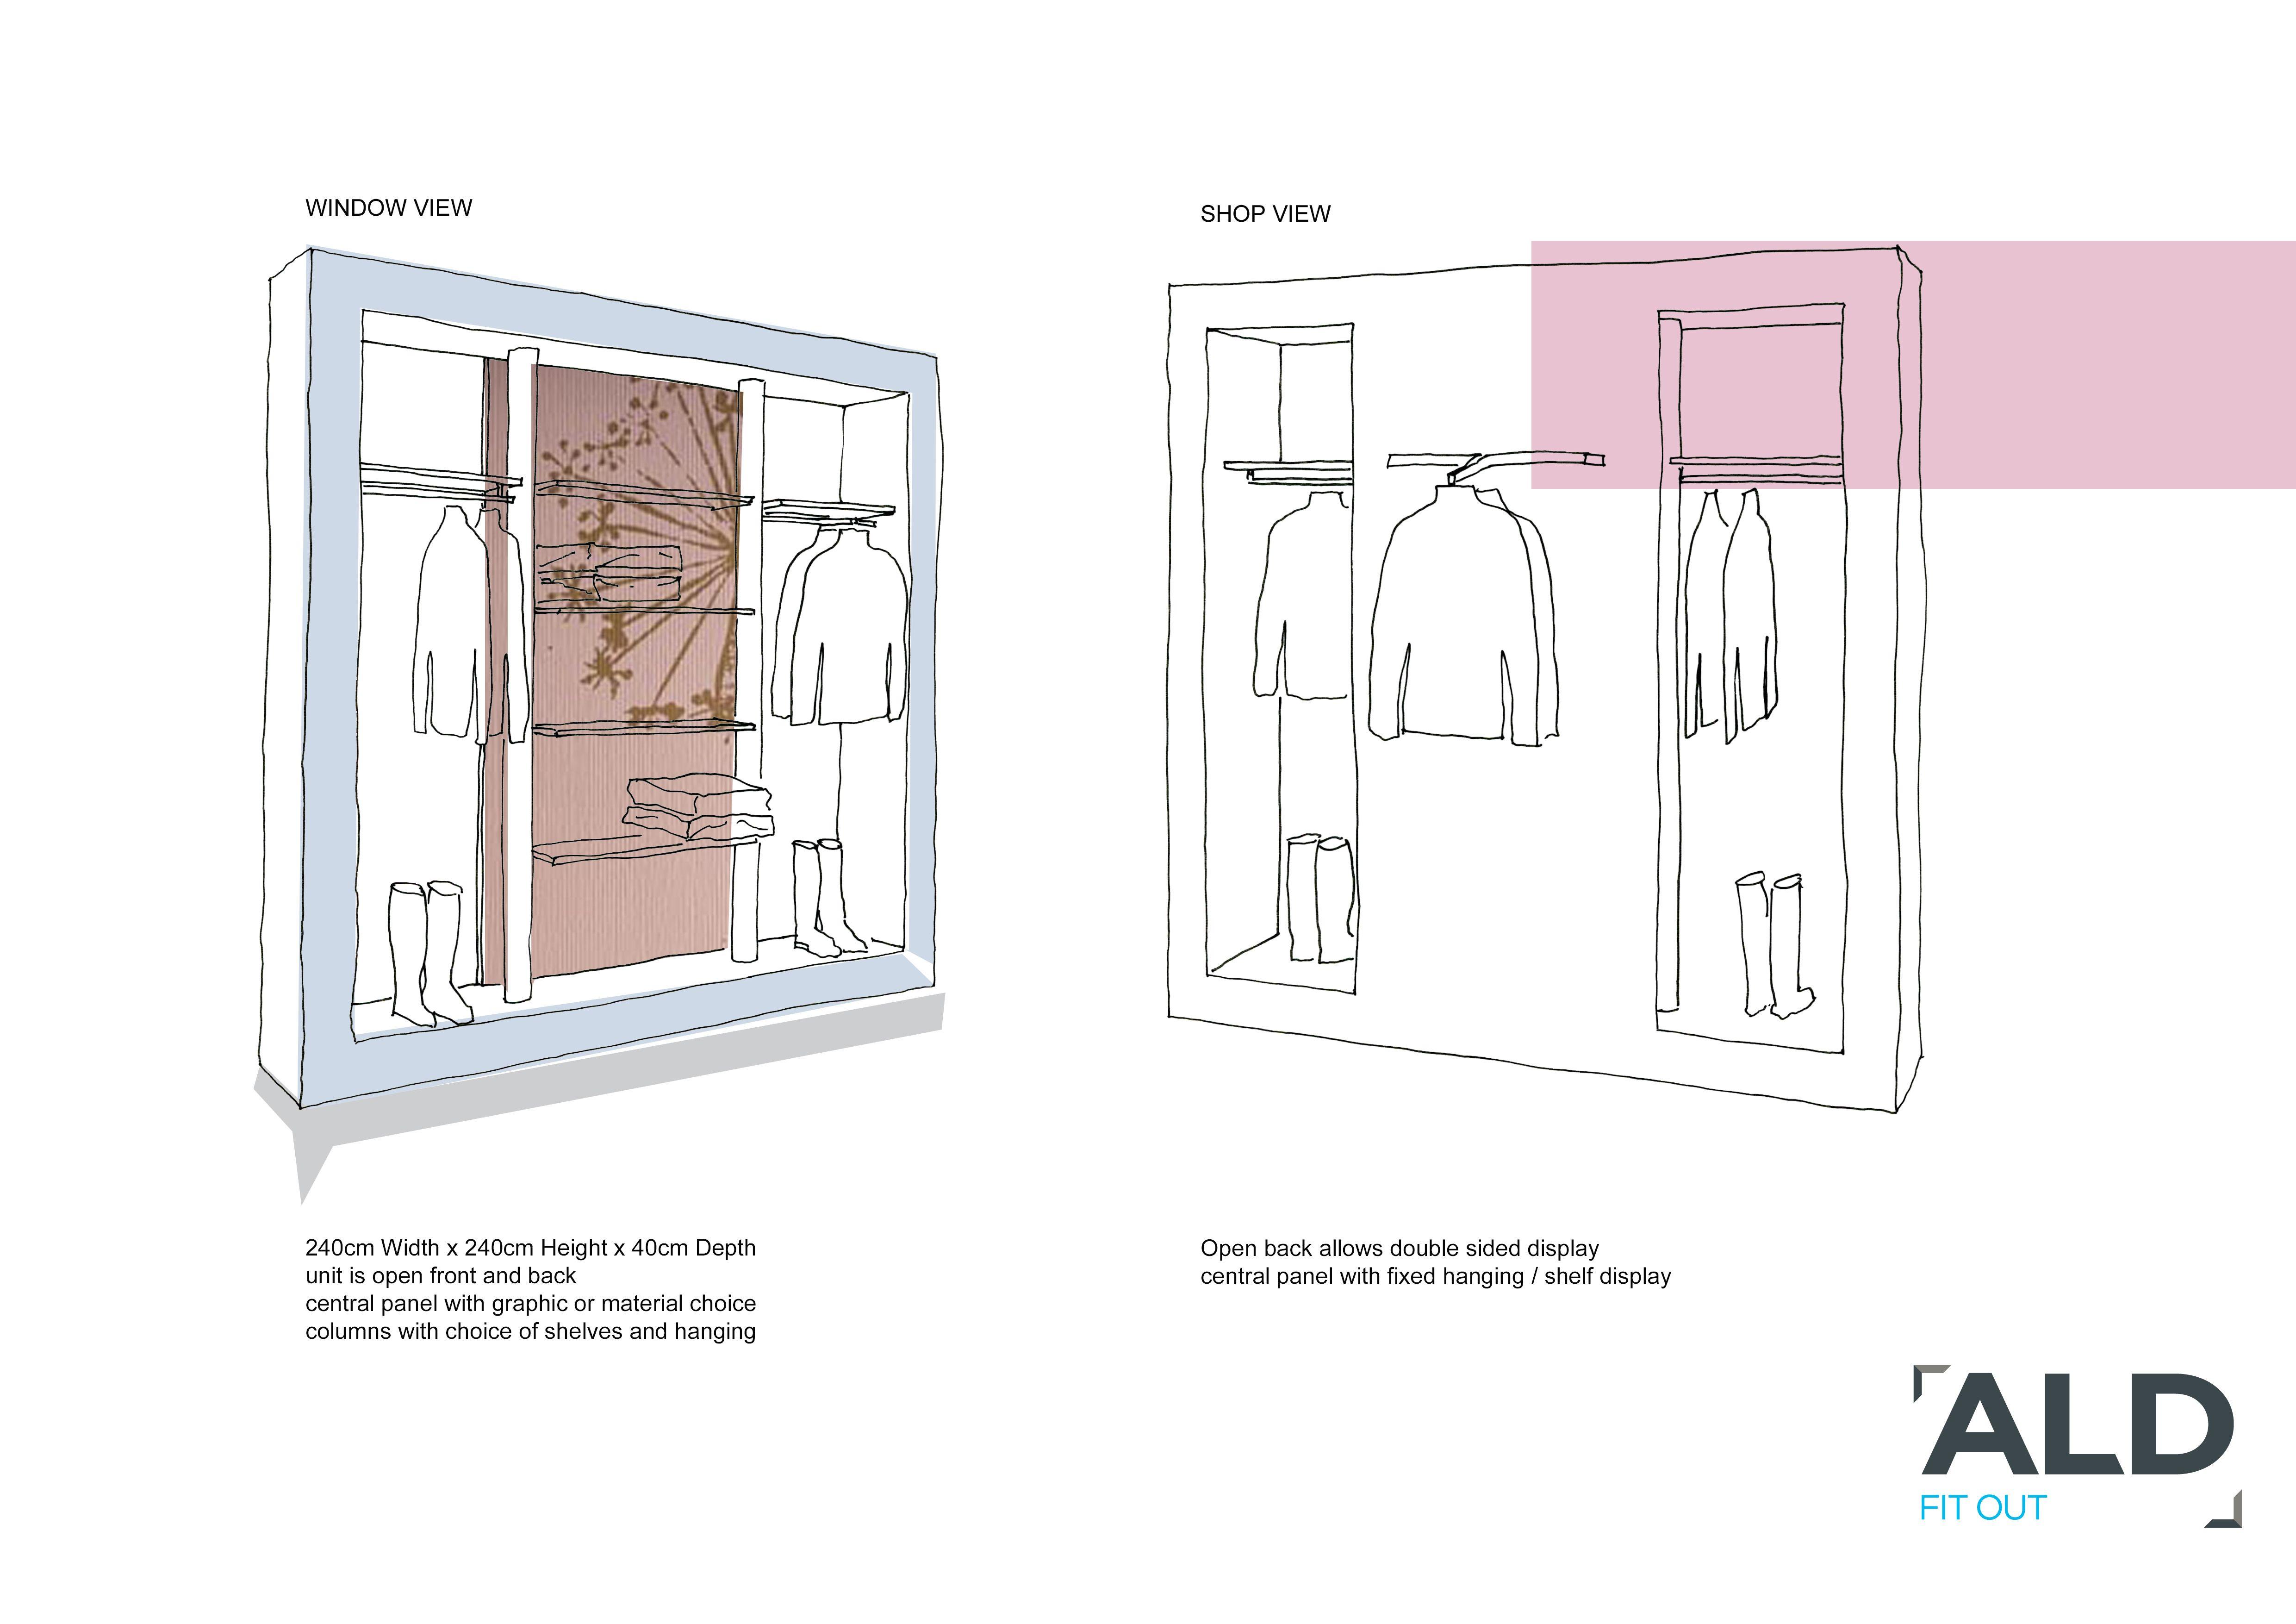 Sketch Design Proposal Boutique Window Display | Uc760u3160 | Pinterest | Boutique Window Displays ...